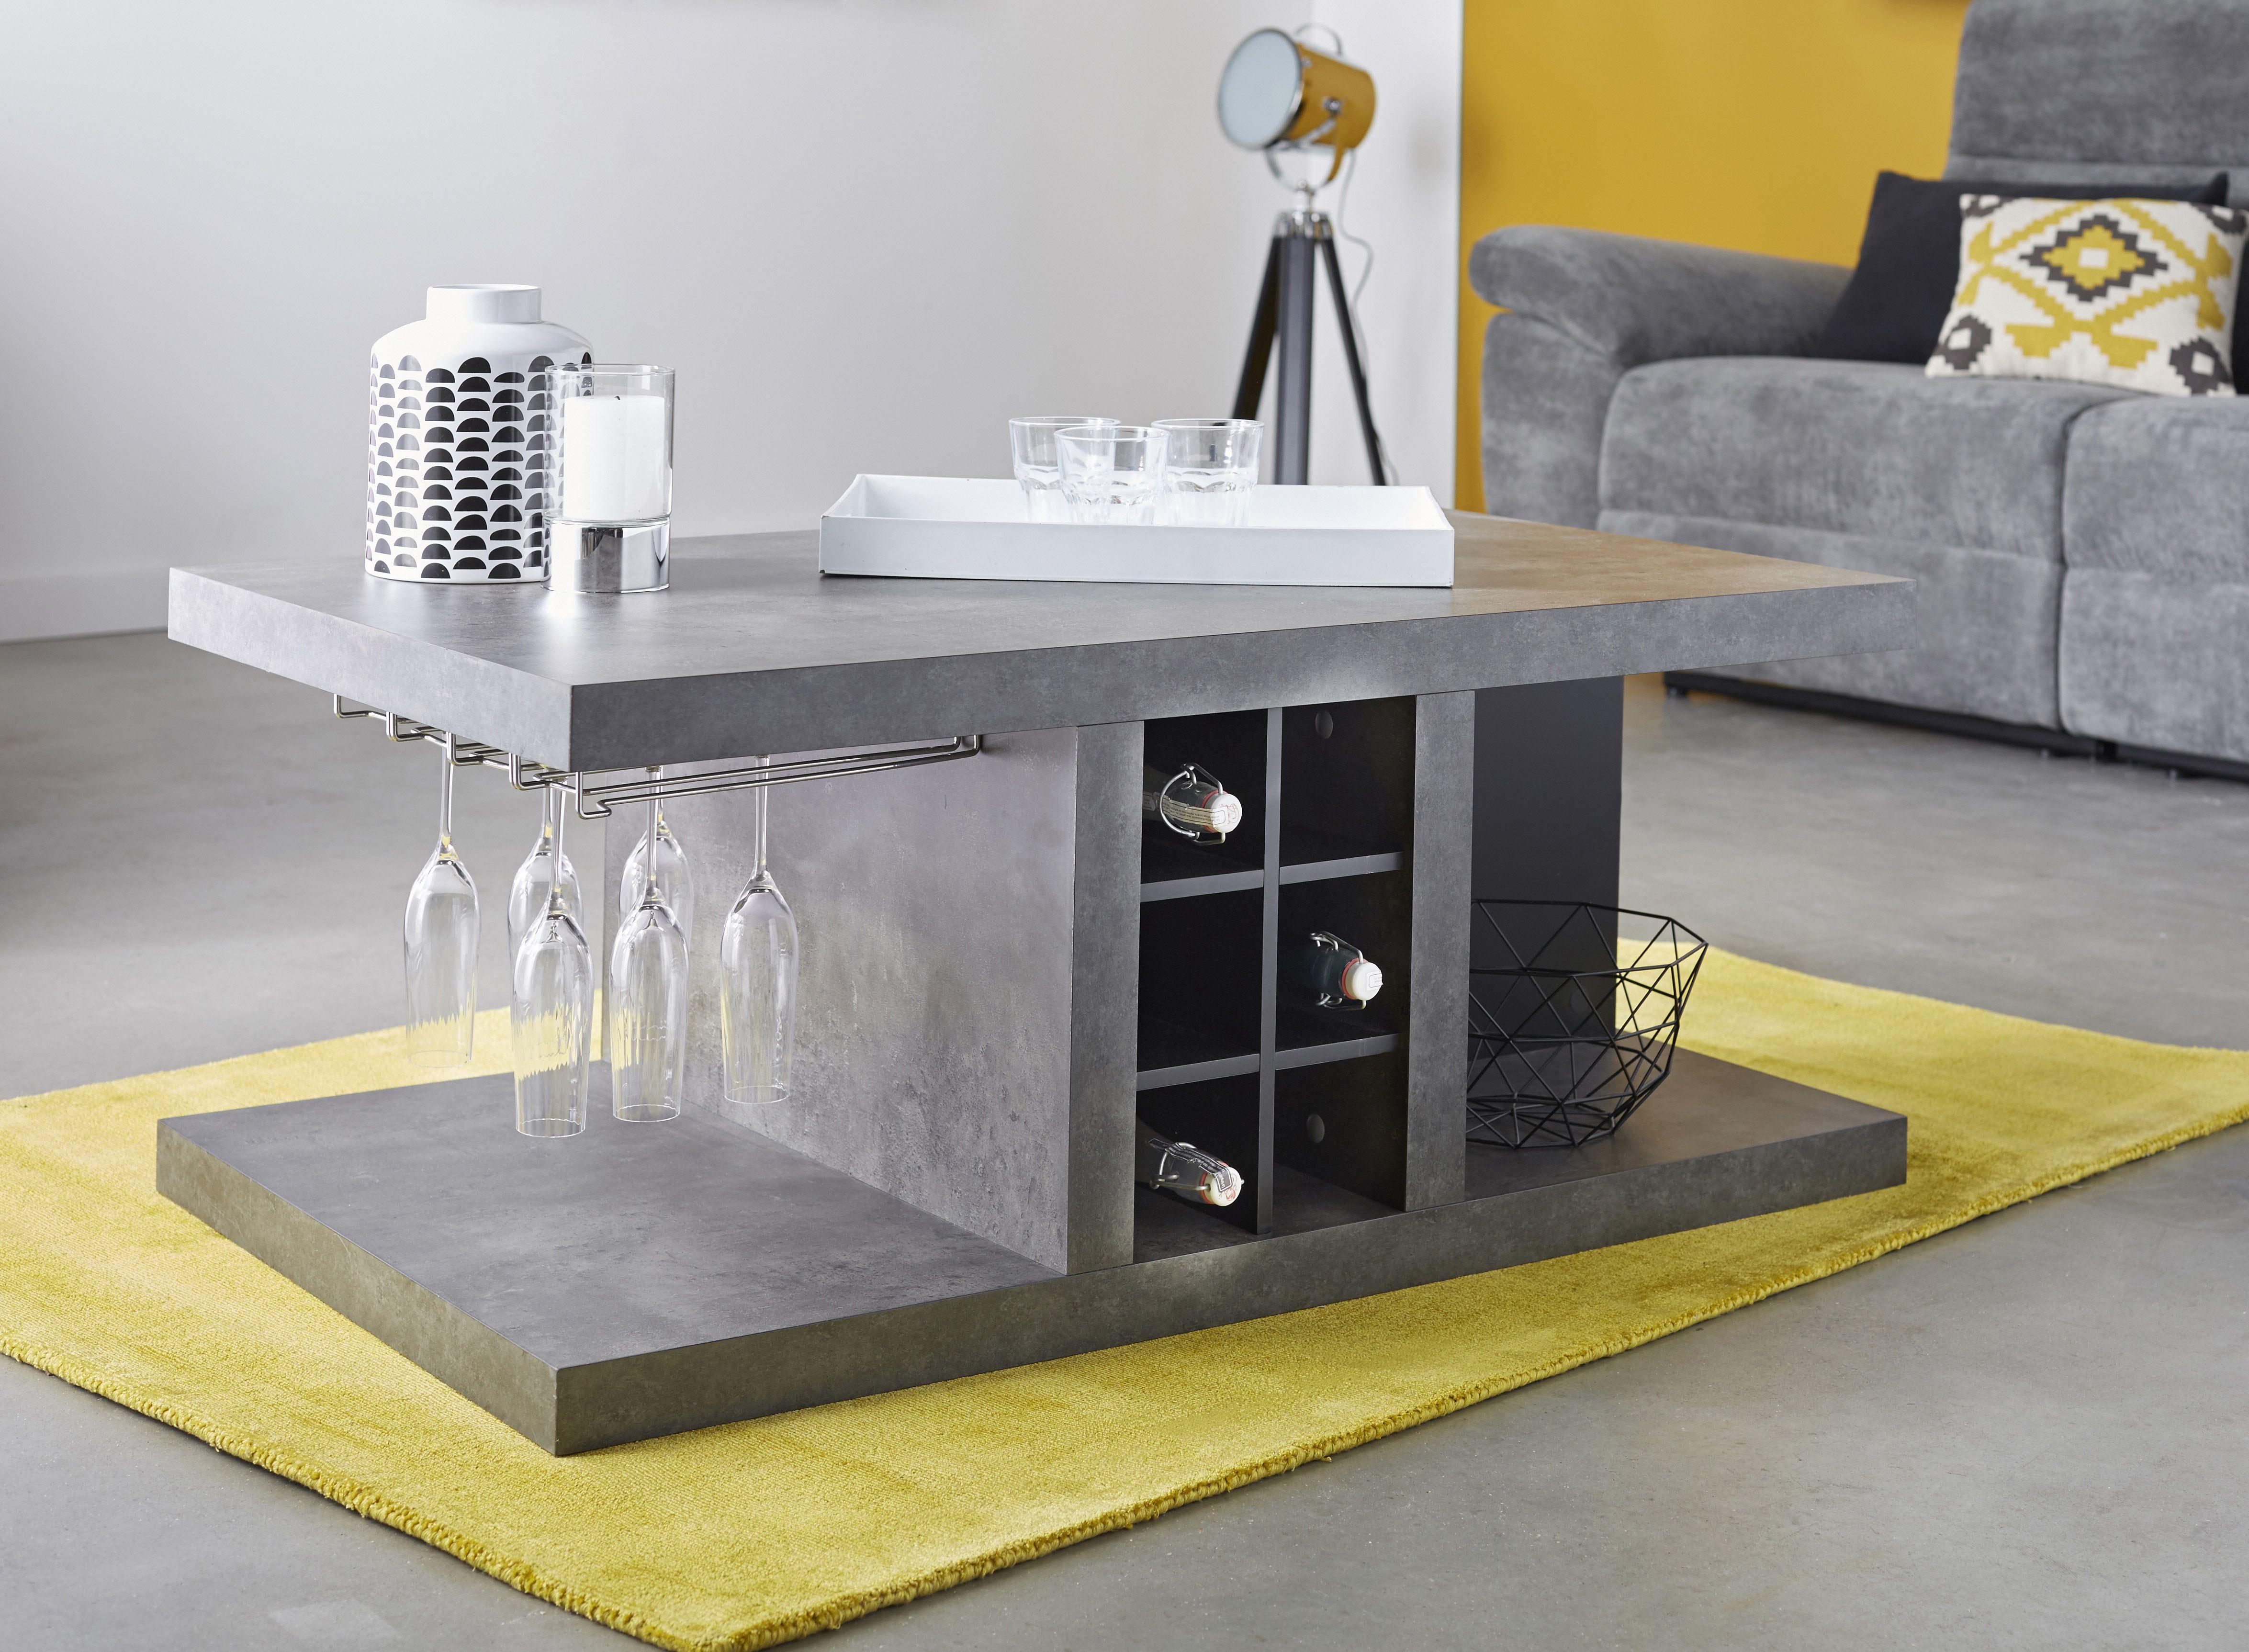 Hilo Table Basse Bar Revetement Effet Beton Decoration Deco Maison Alinea Table Basse Bar Table Basse Table Basse Beton